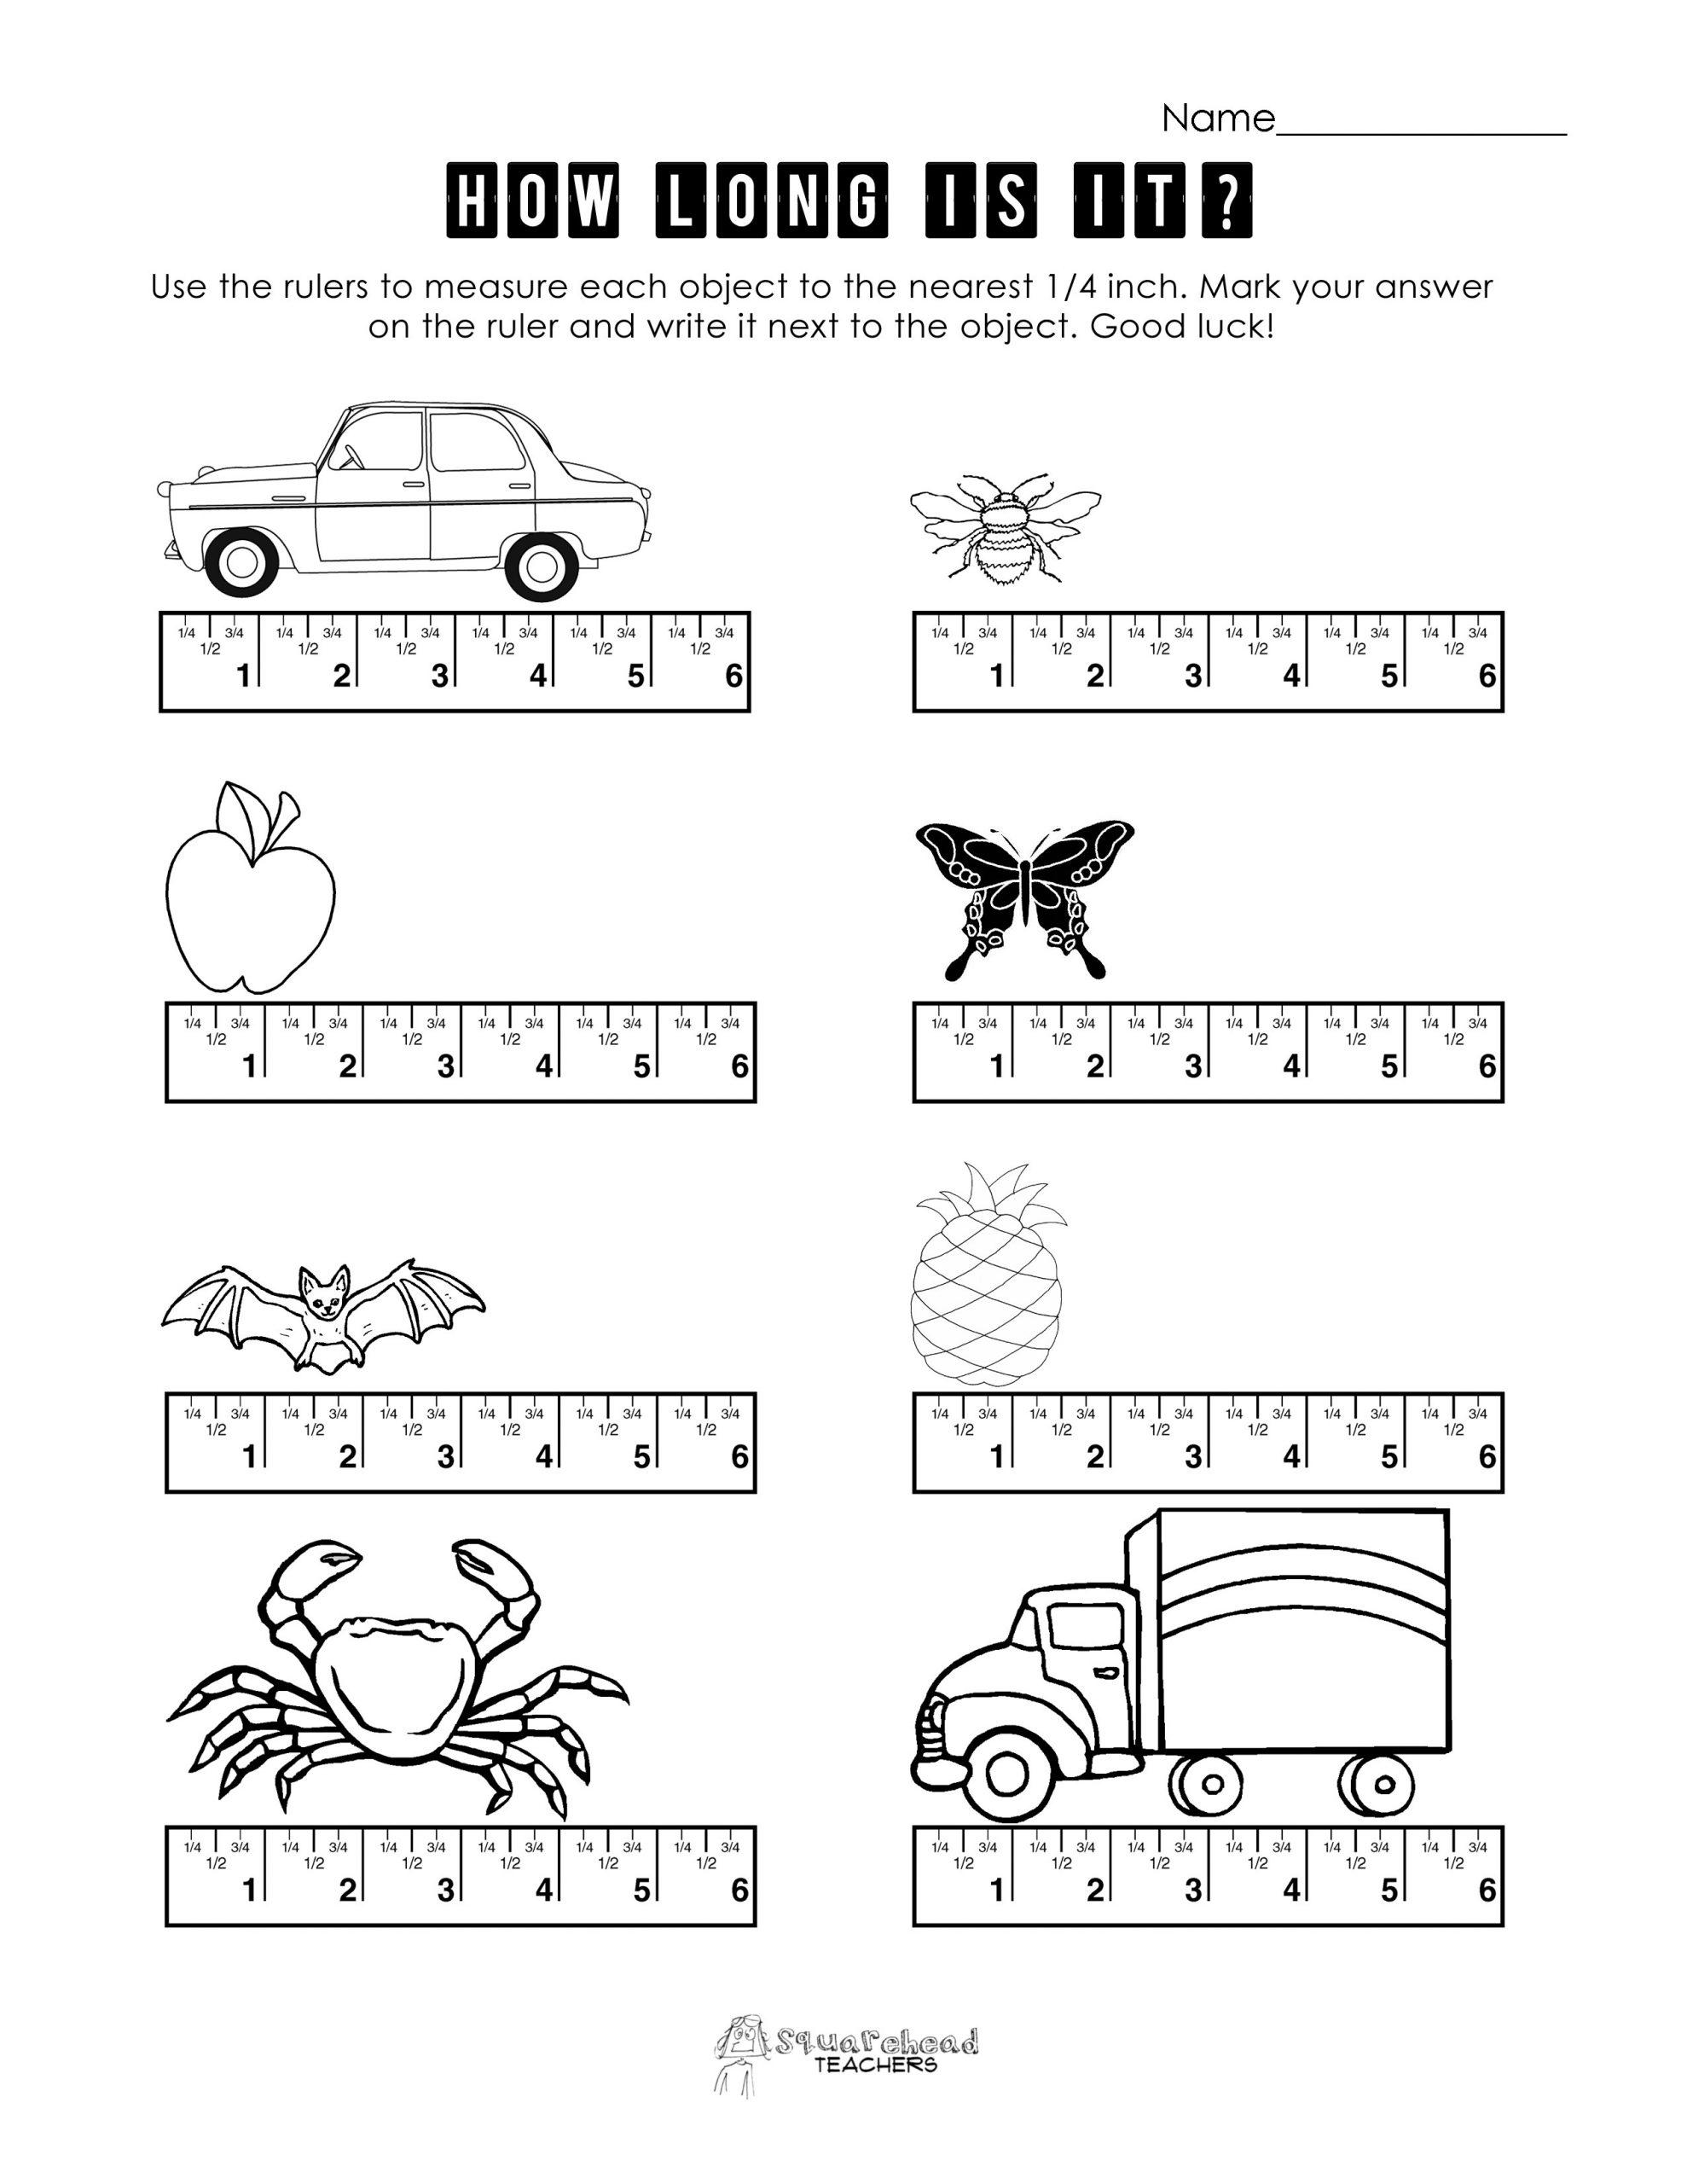 Reading A Ruler Worksheet Pdf Measurement Practice 1